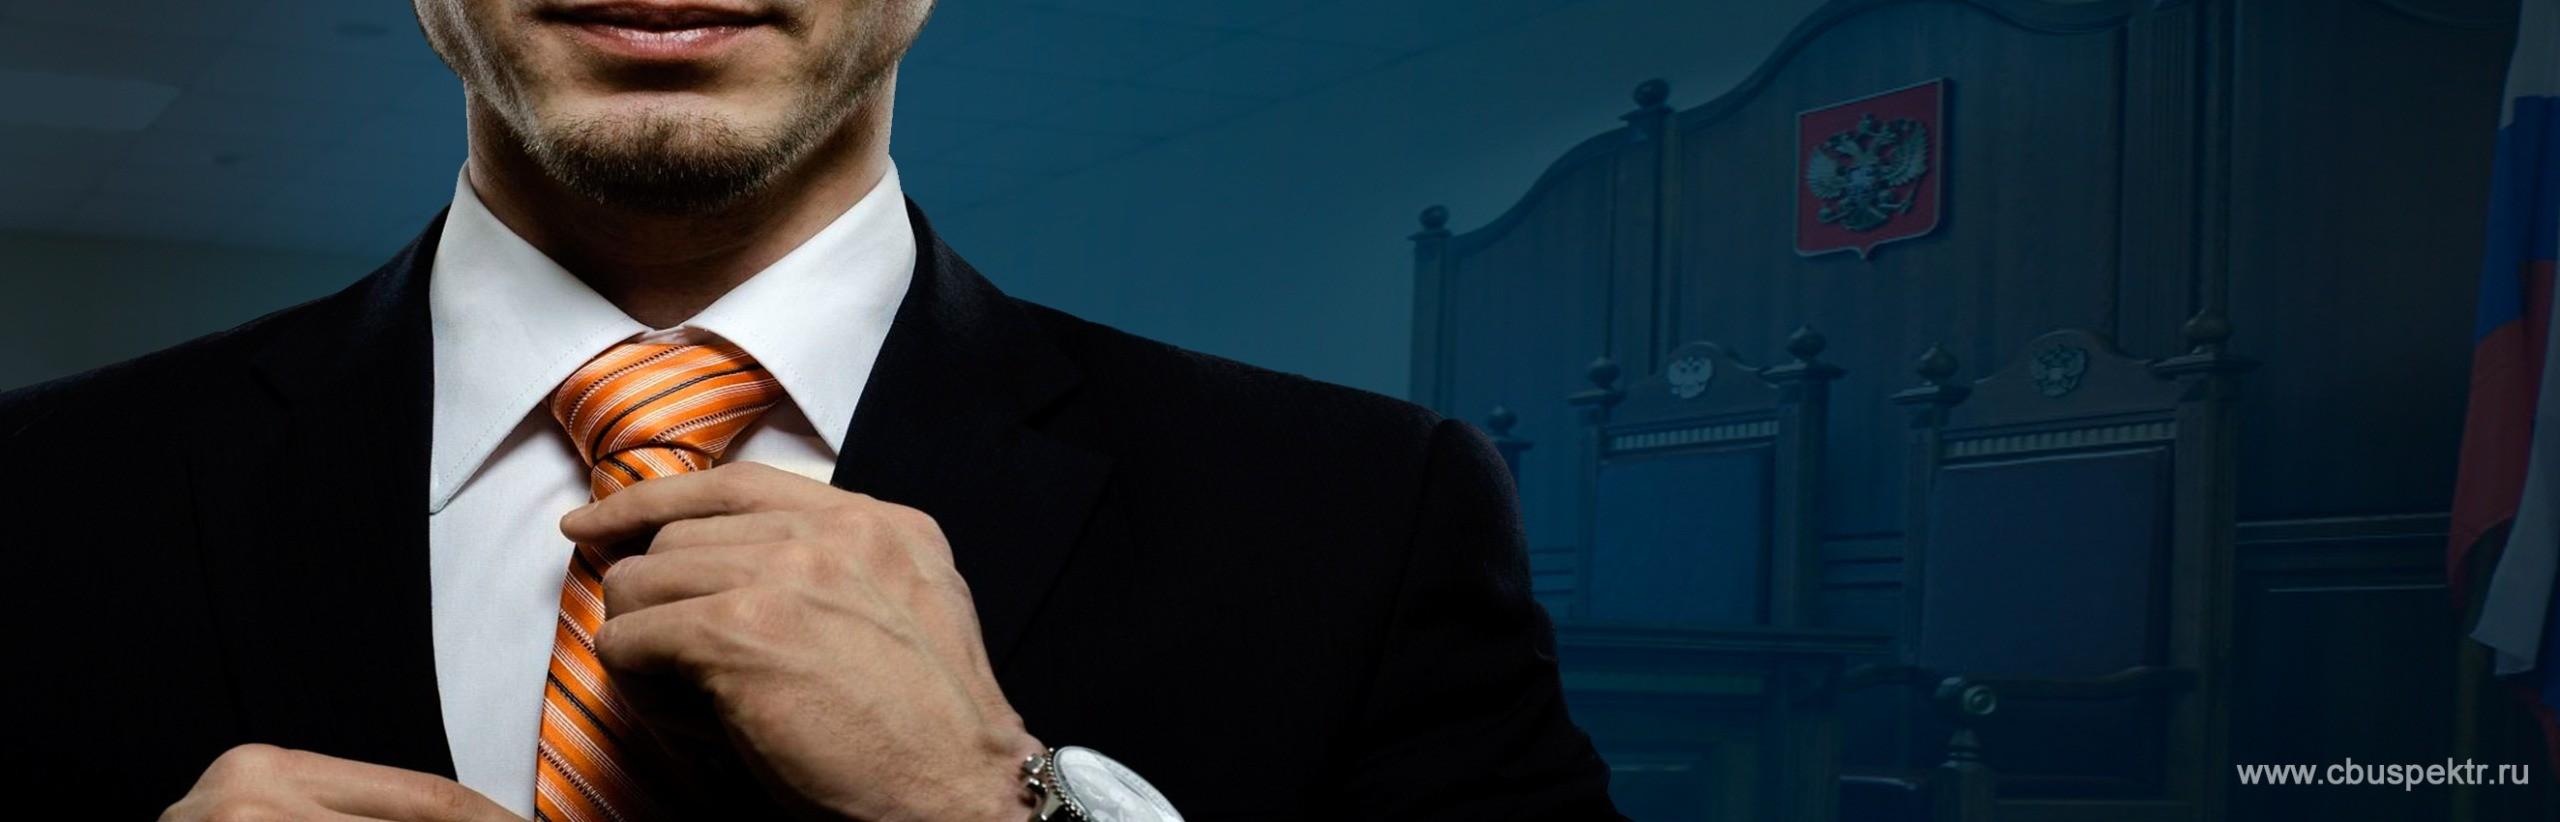 Мужчина поправляет галстук на фоне зала суда